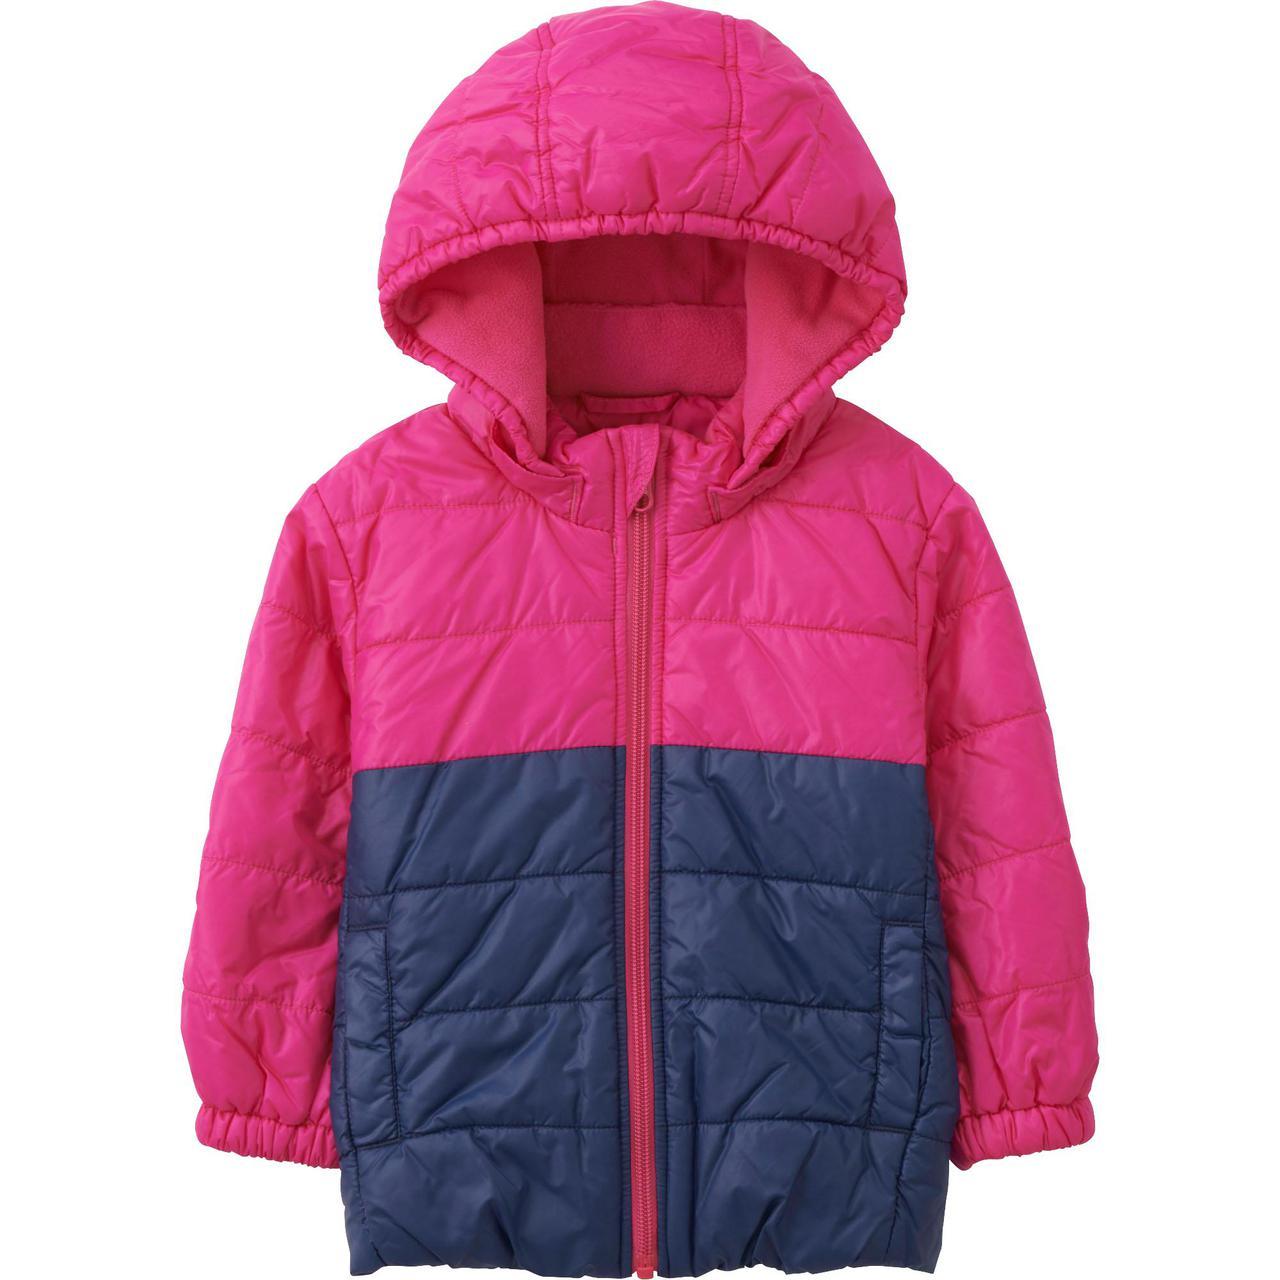 Куртка Uniqlo babies toddler body warm lite long sleeve Pink